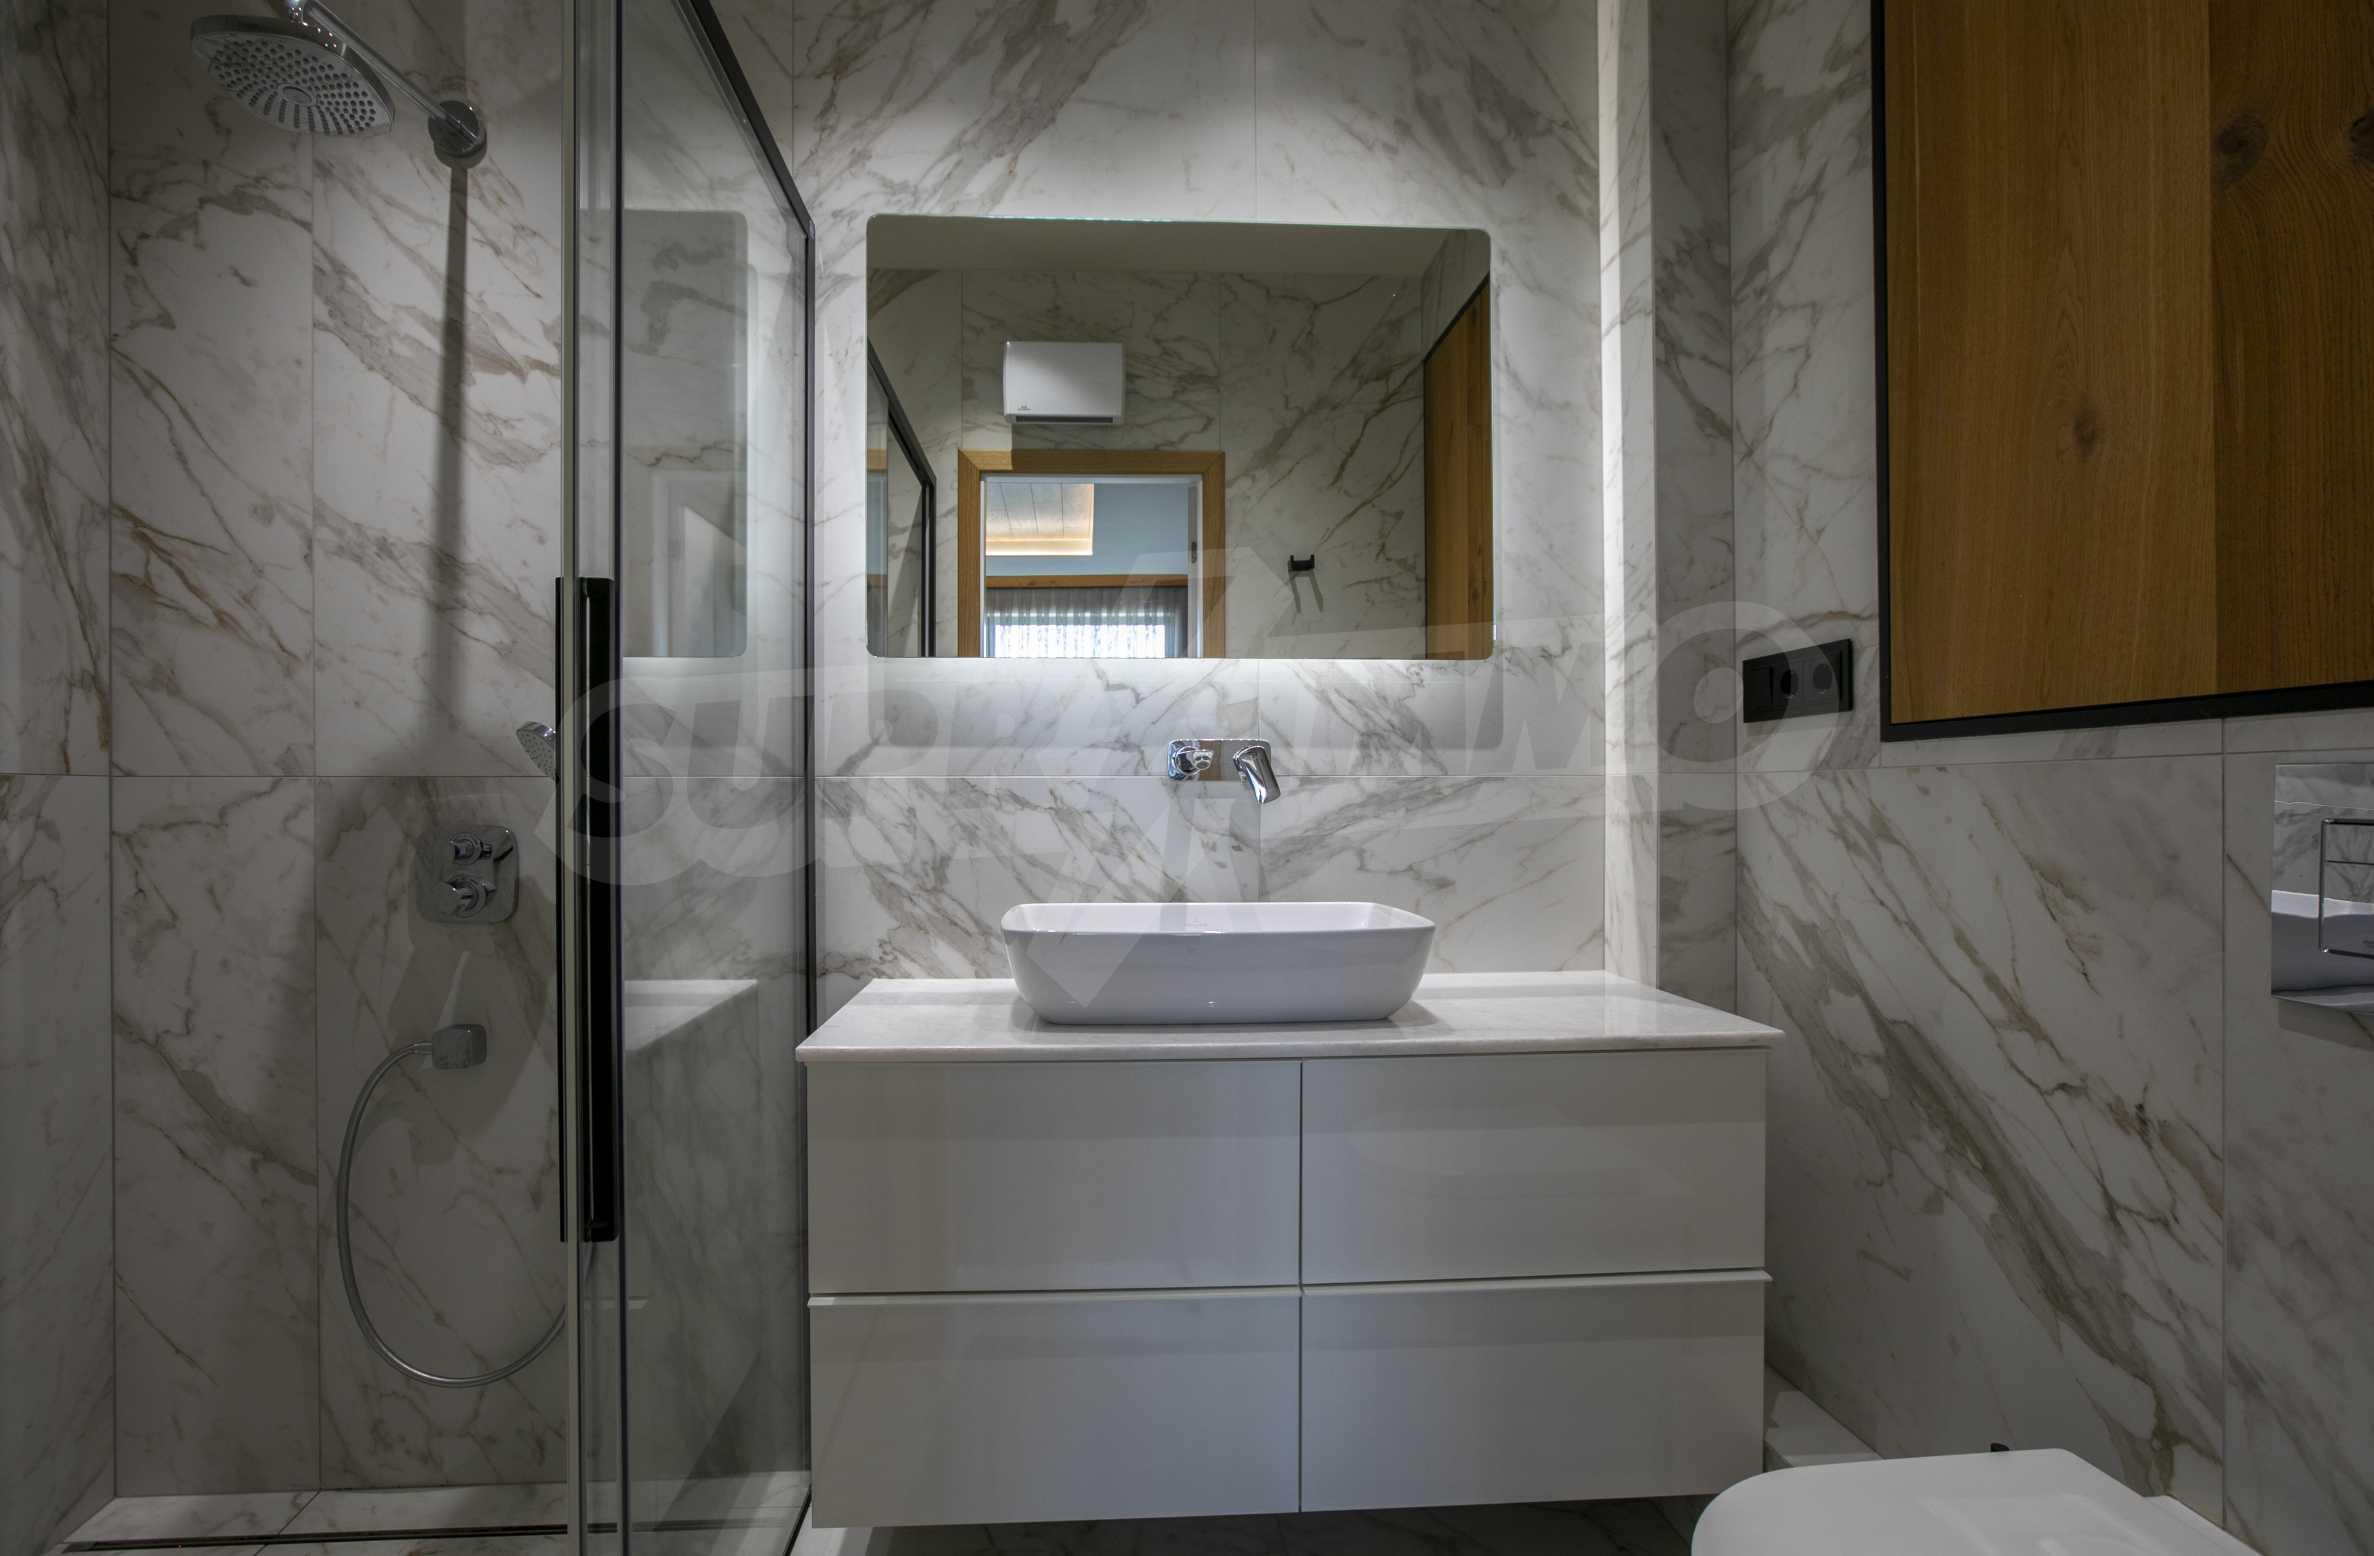 Дизайнерски обзаведен многостаен апартамент 10